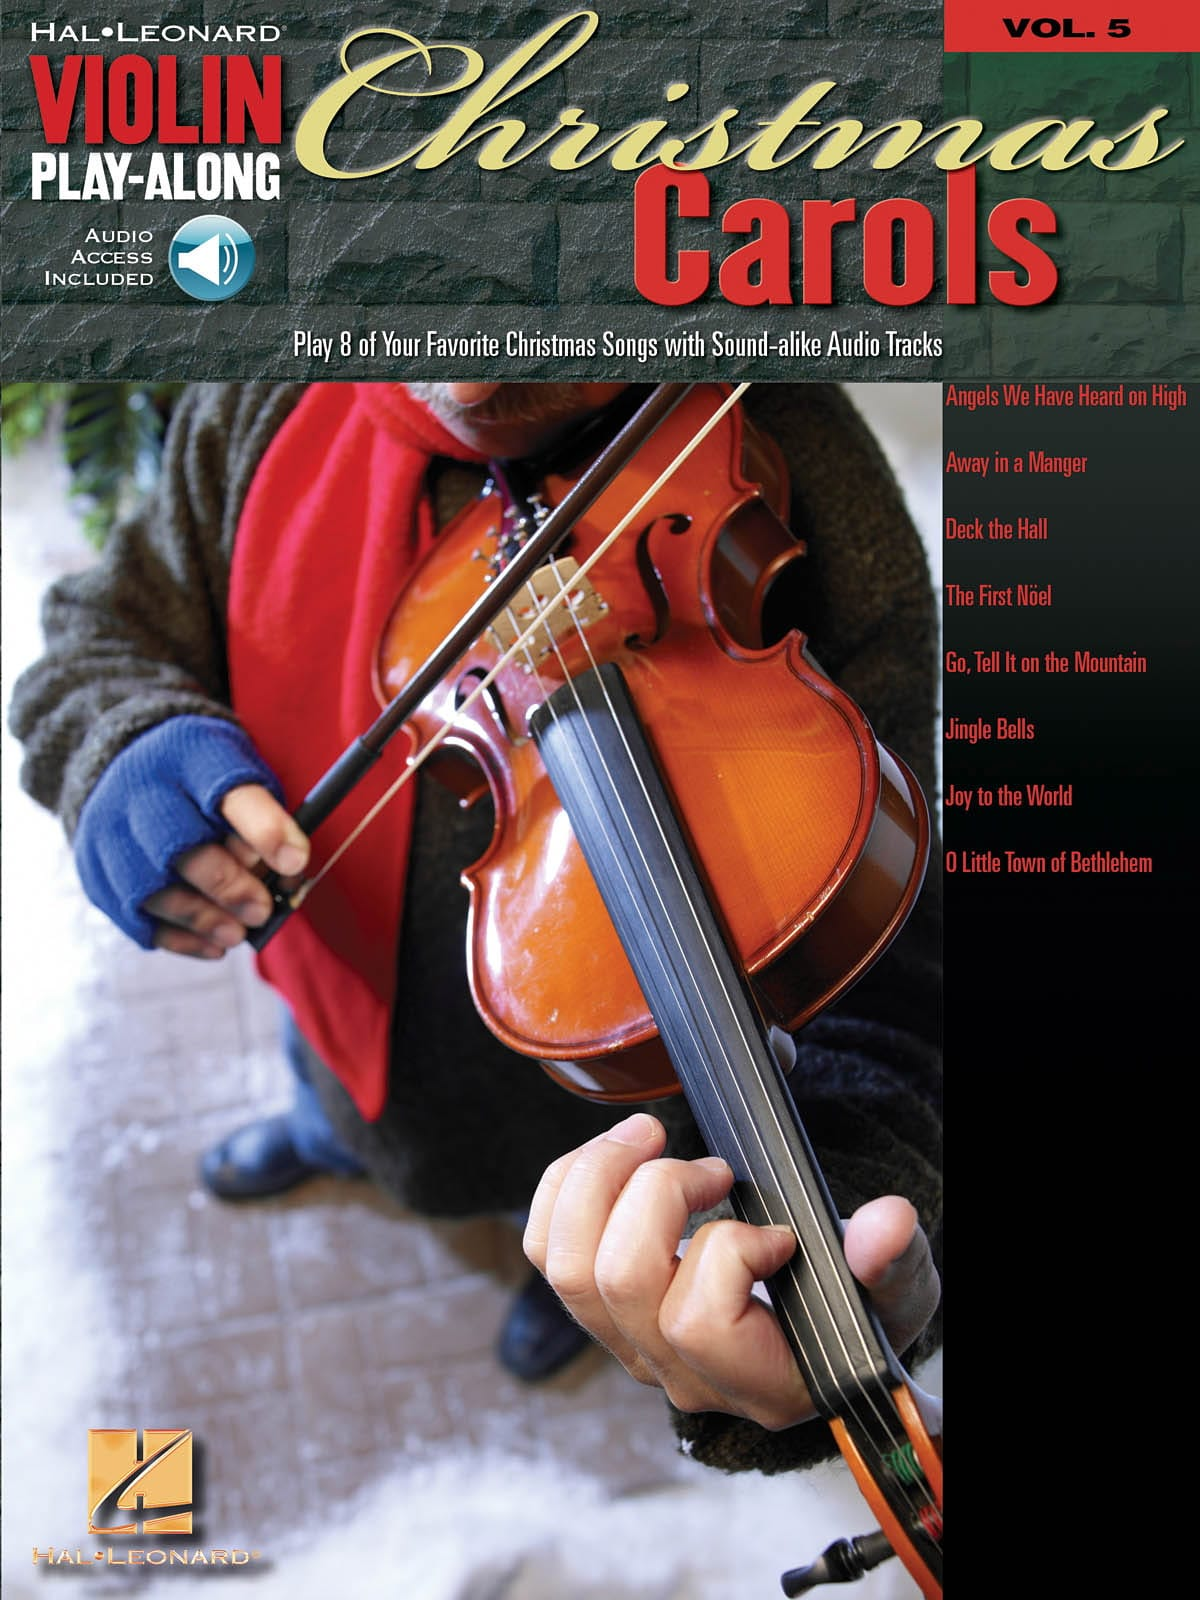 Noël - Violin play-along volume 5 - Christmas Carols - Partition - di-arezzo.co.uk